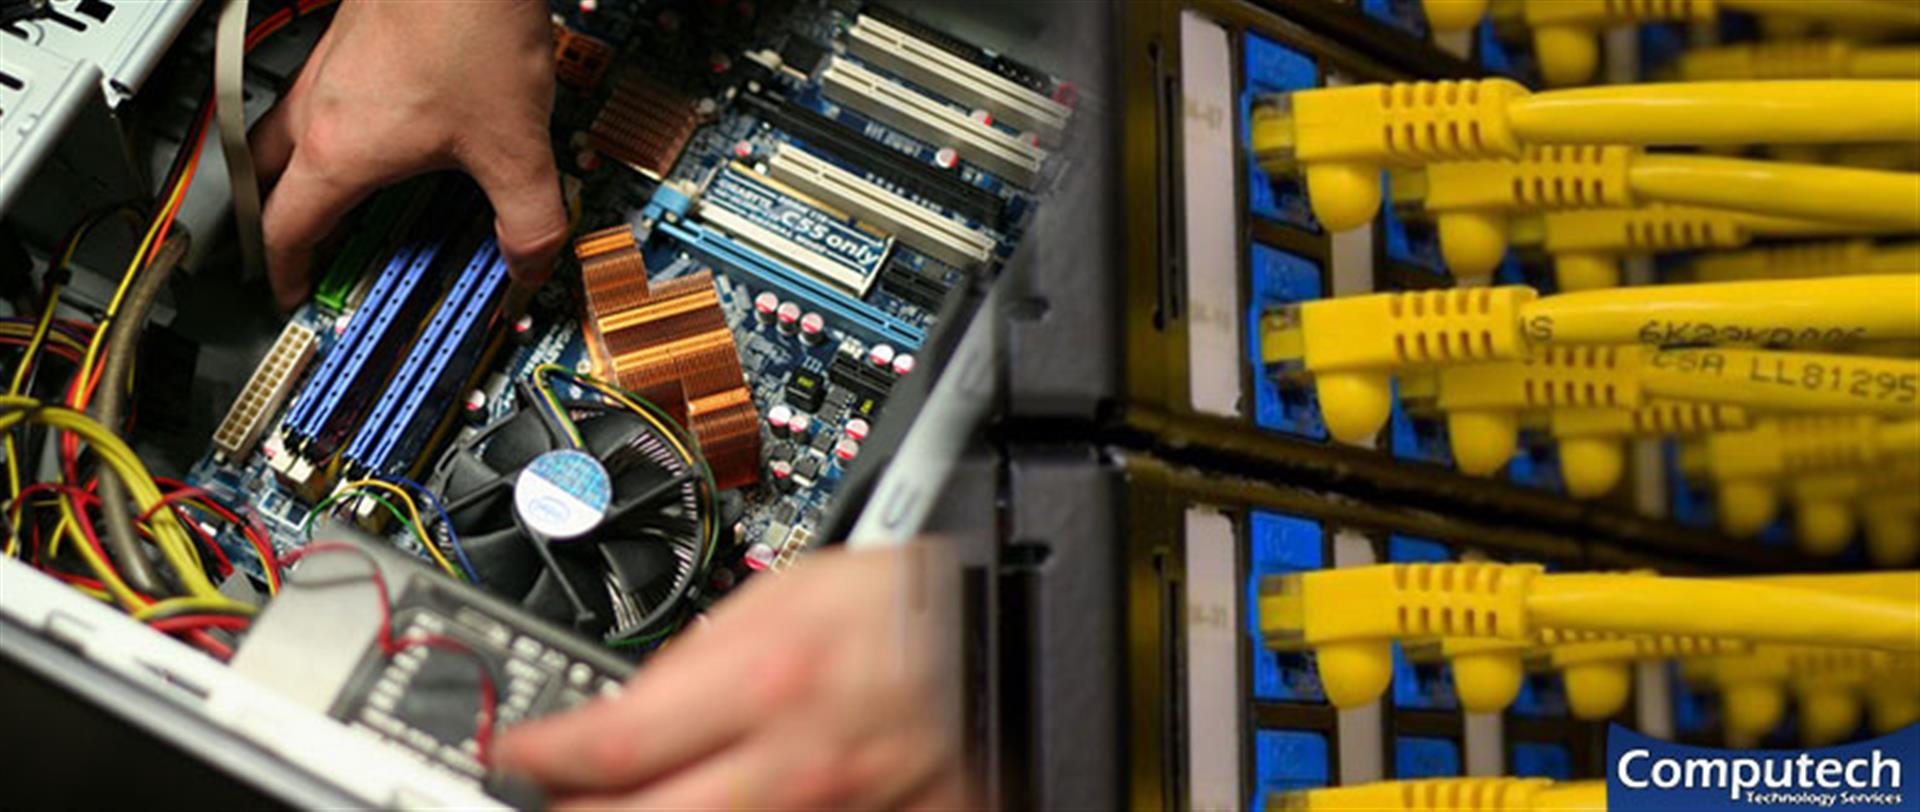 Arab Alabama Onsite Computer & Printer Repairs, Network, Telecom & Data Wiring Solutions